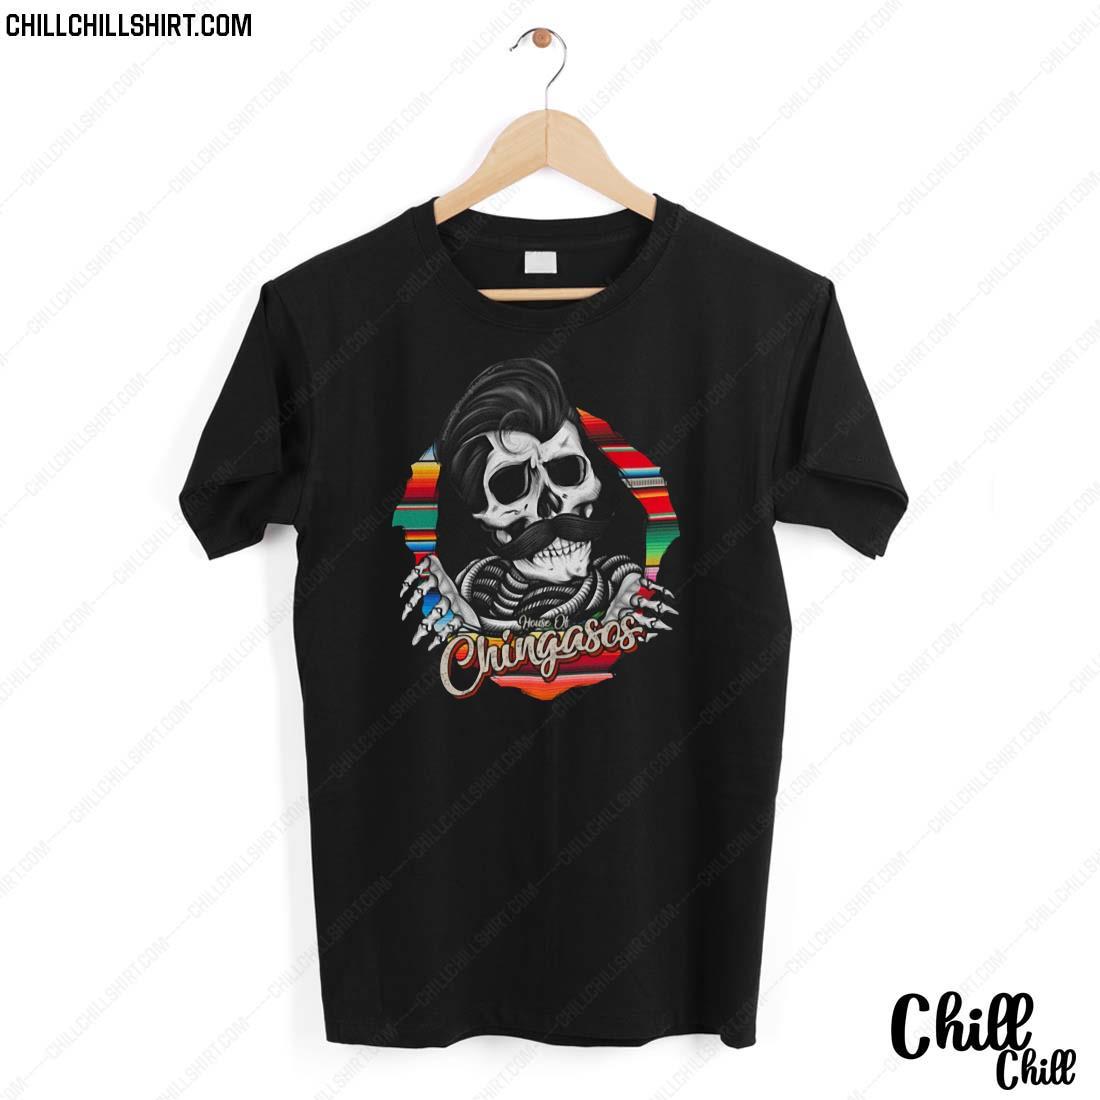 Chingasos Raza Pride Og Tee Shirt